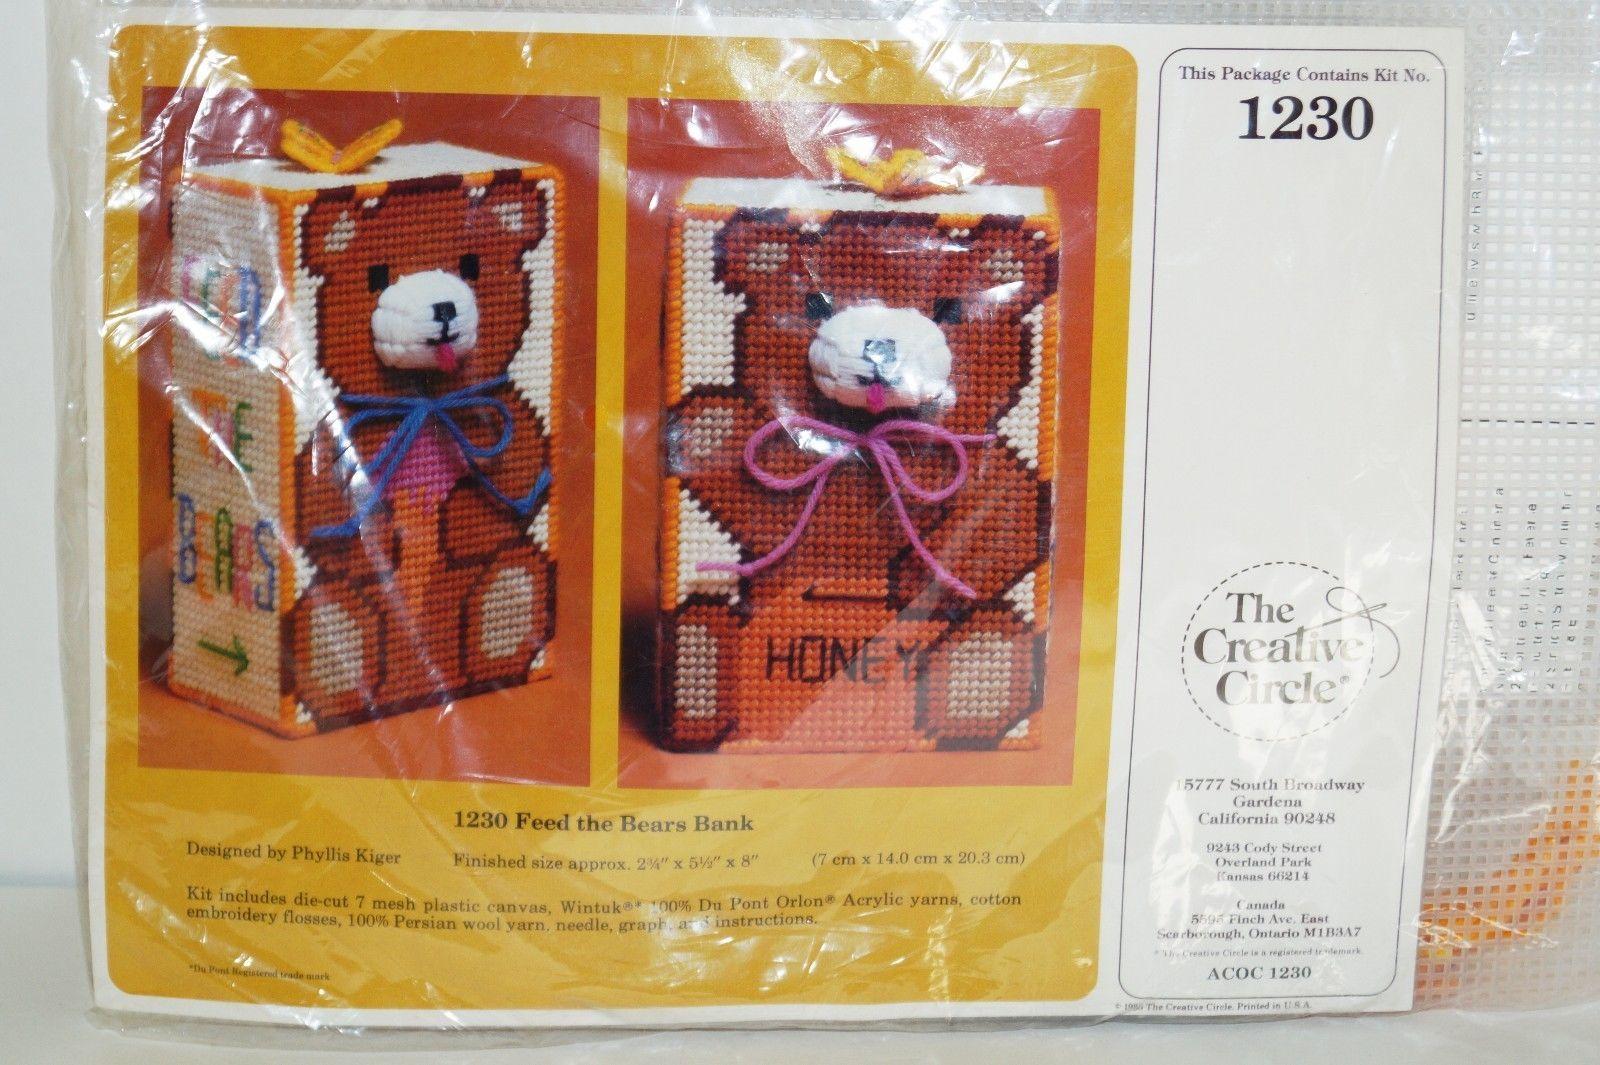 The Creative Circle Feed the Bears Bank - $23.10